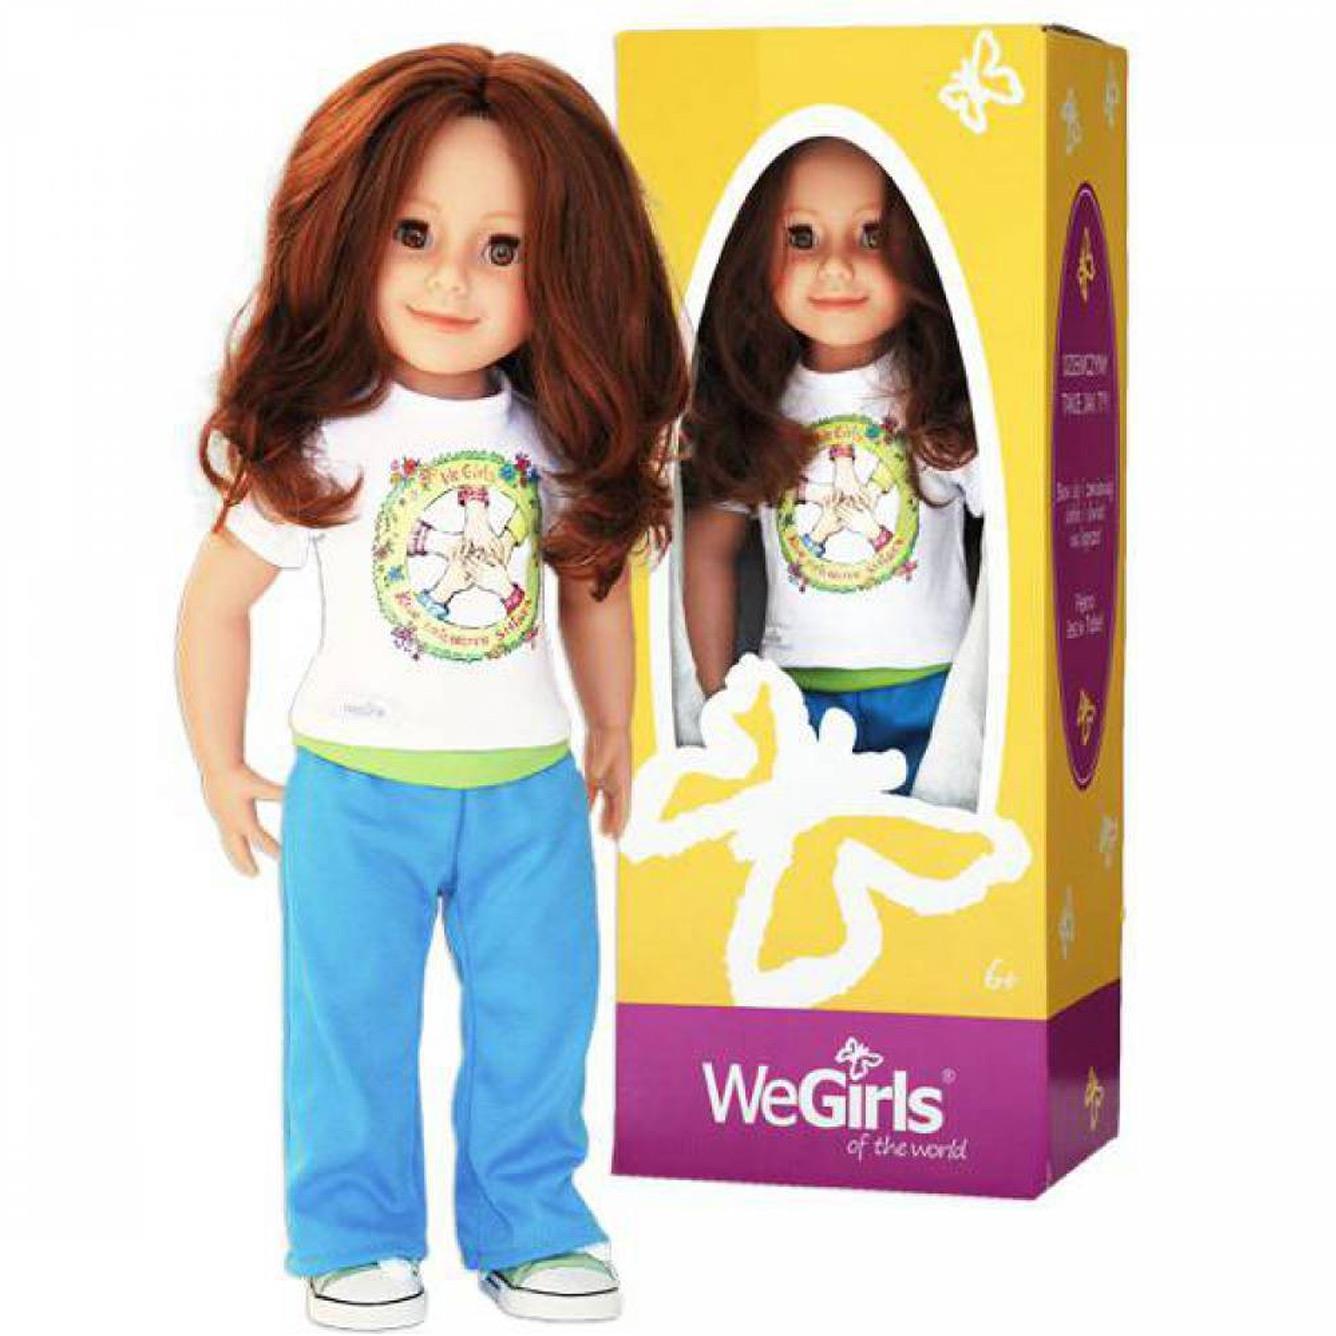 Lalki WeGirls (ubranka i akcesoria dla lalek oraz serie literackie WeGirls)